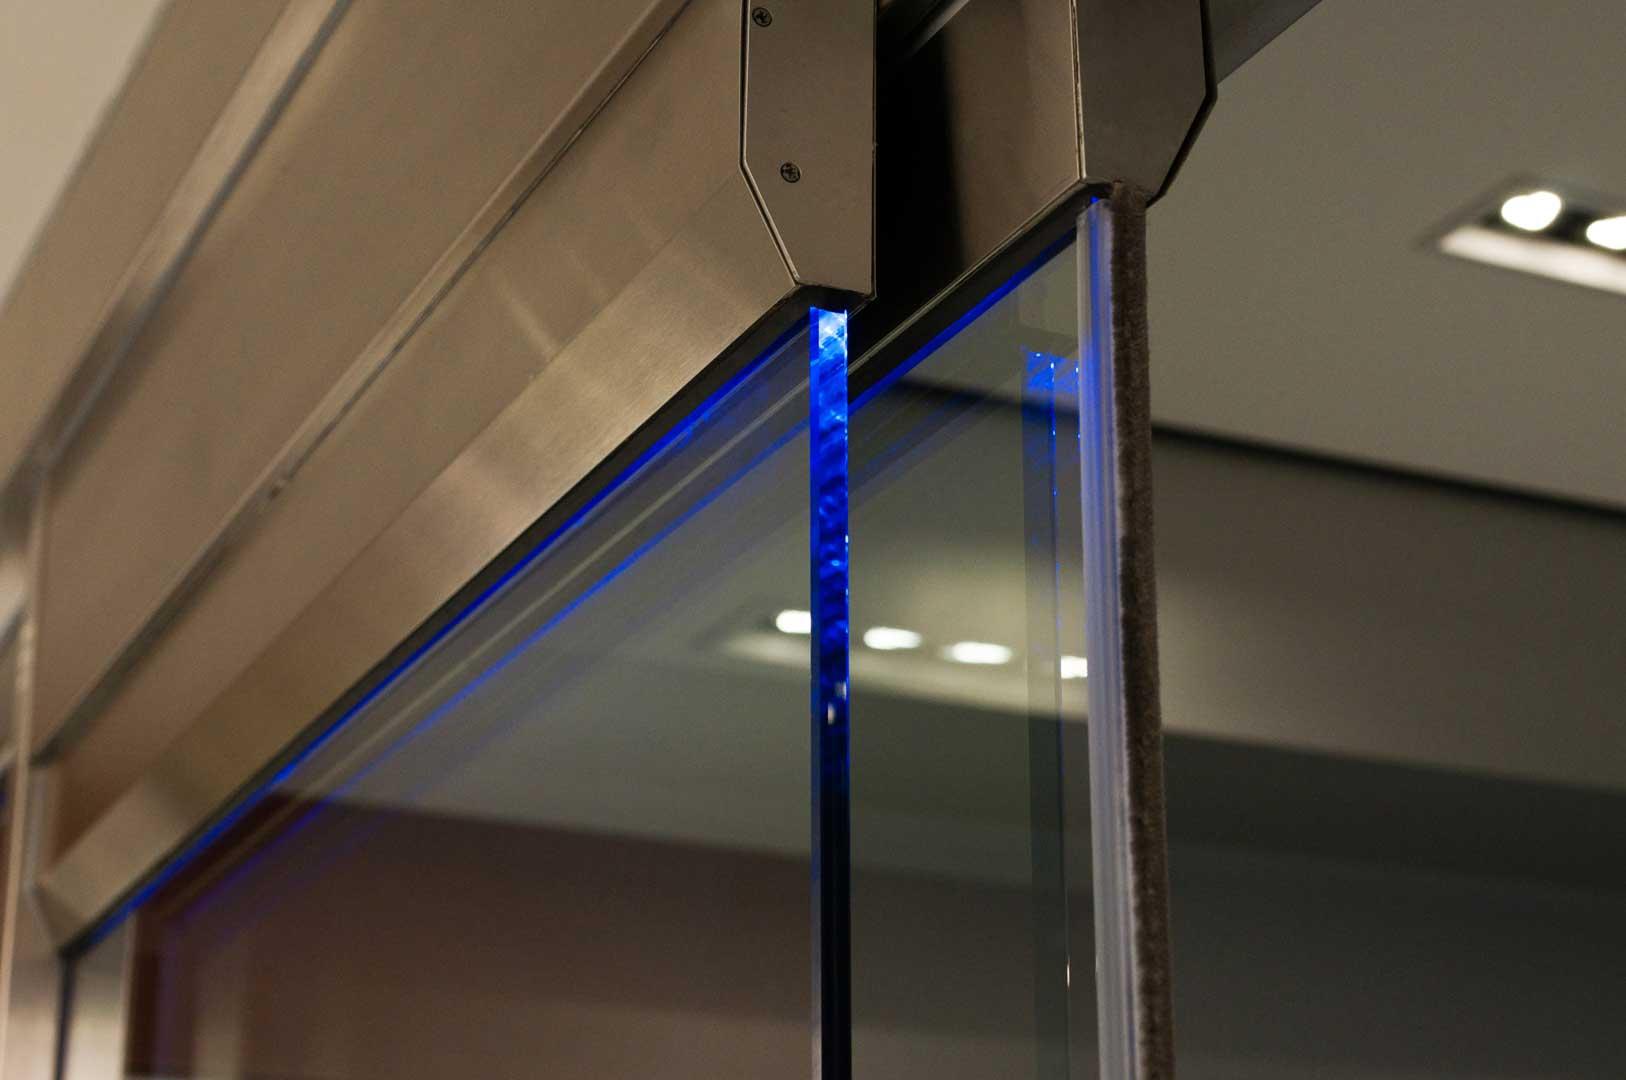 Top Door edge of a Tormax Sliding door system showcasing blue LED lights